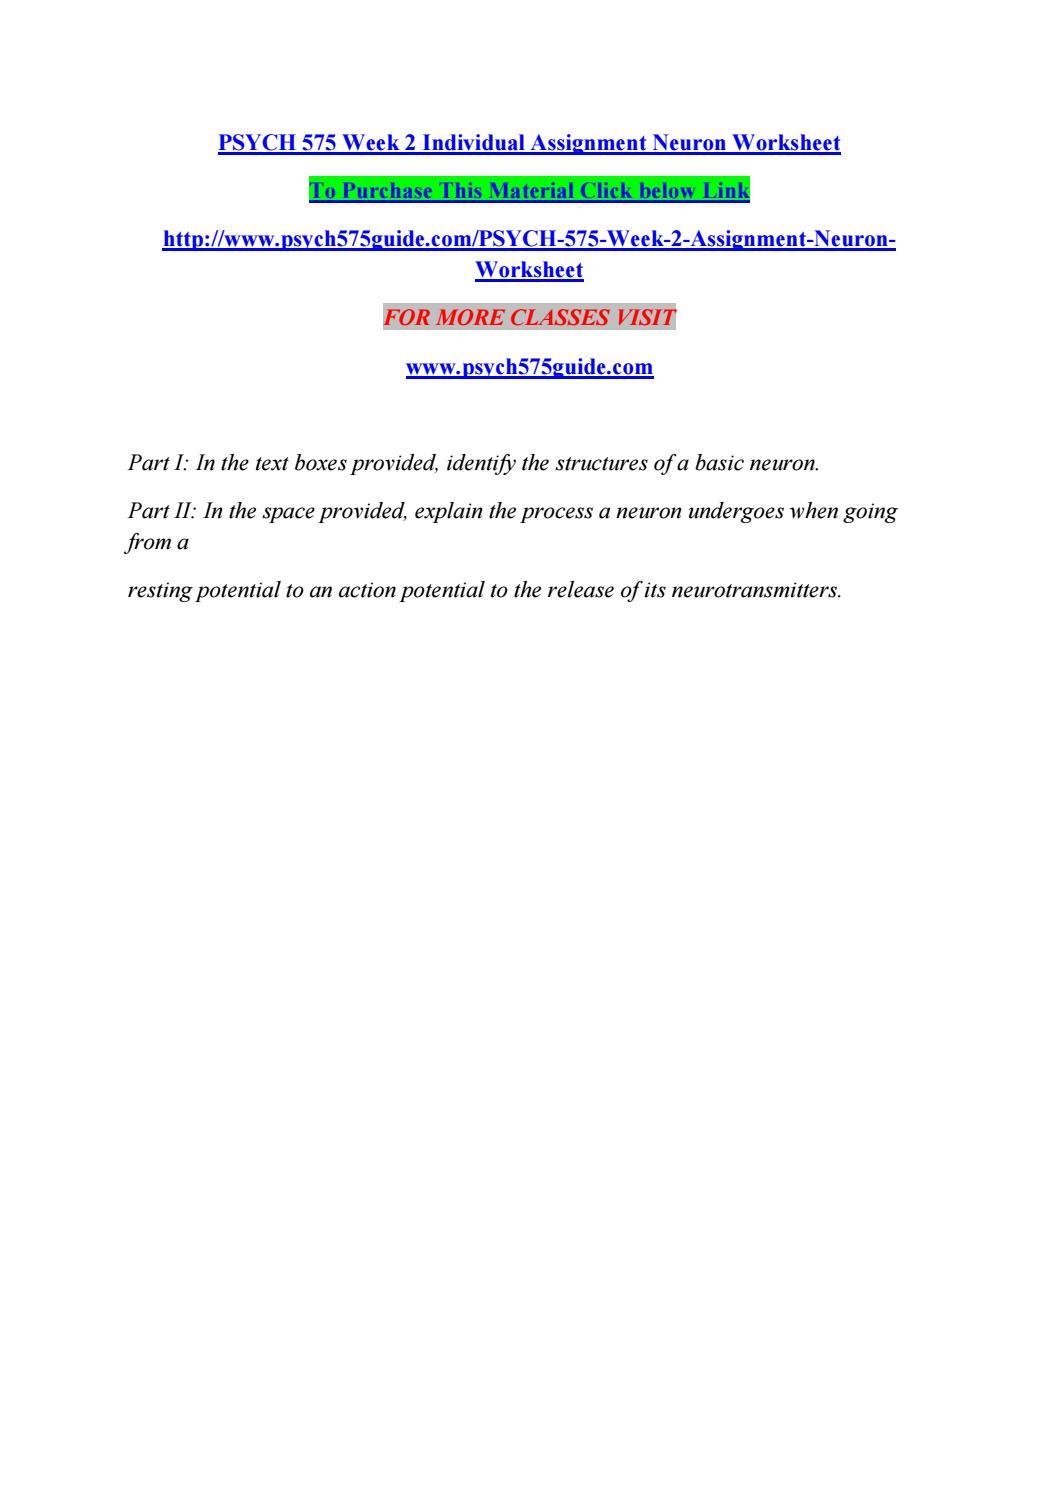 worksheet Neuron Worksheet psych 575 week 2 individual assignment neuron worksheet by watsonmiclasa issuu